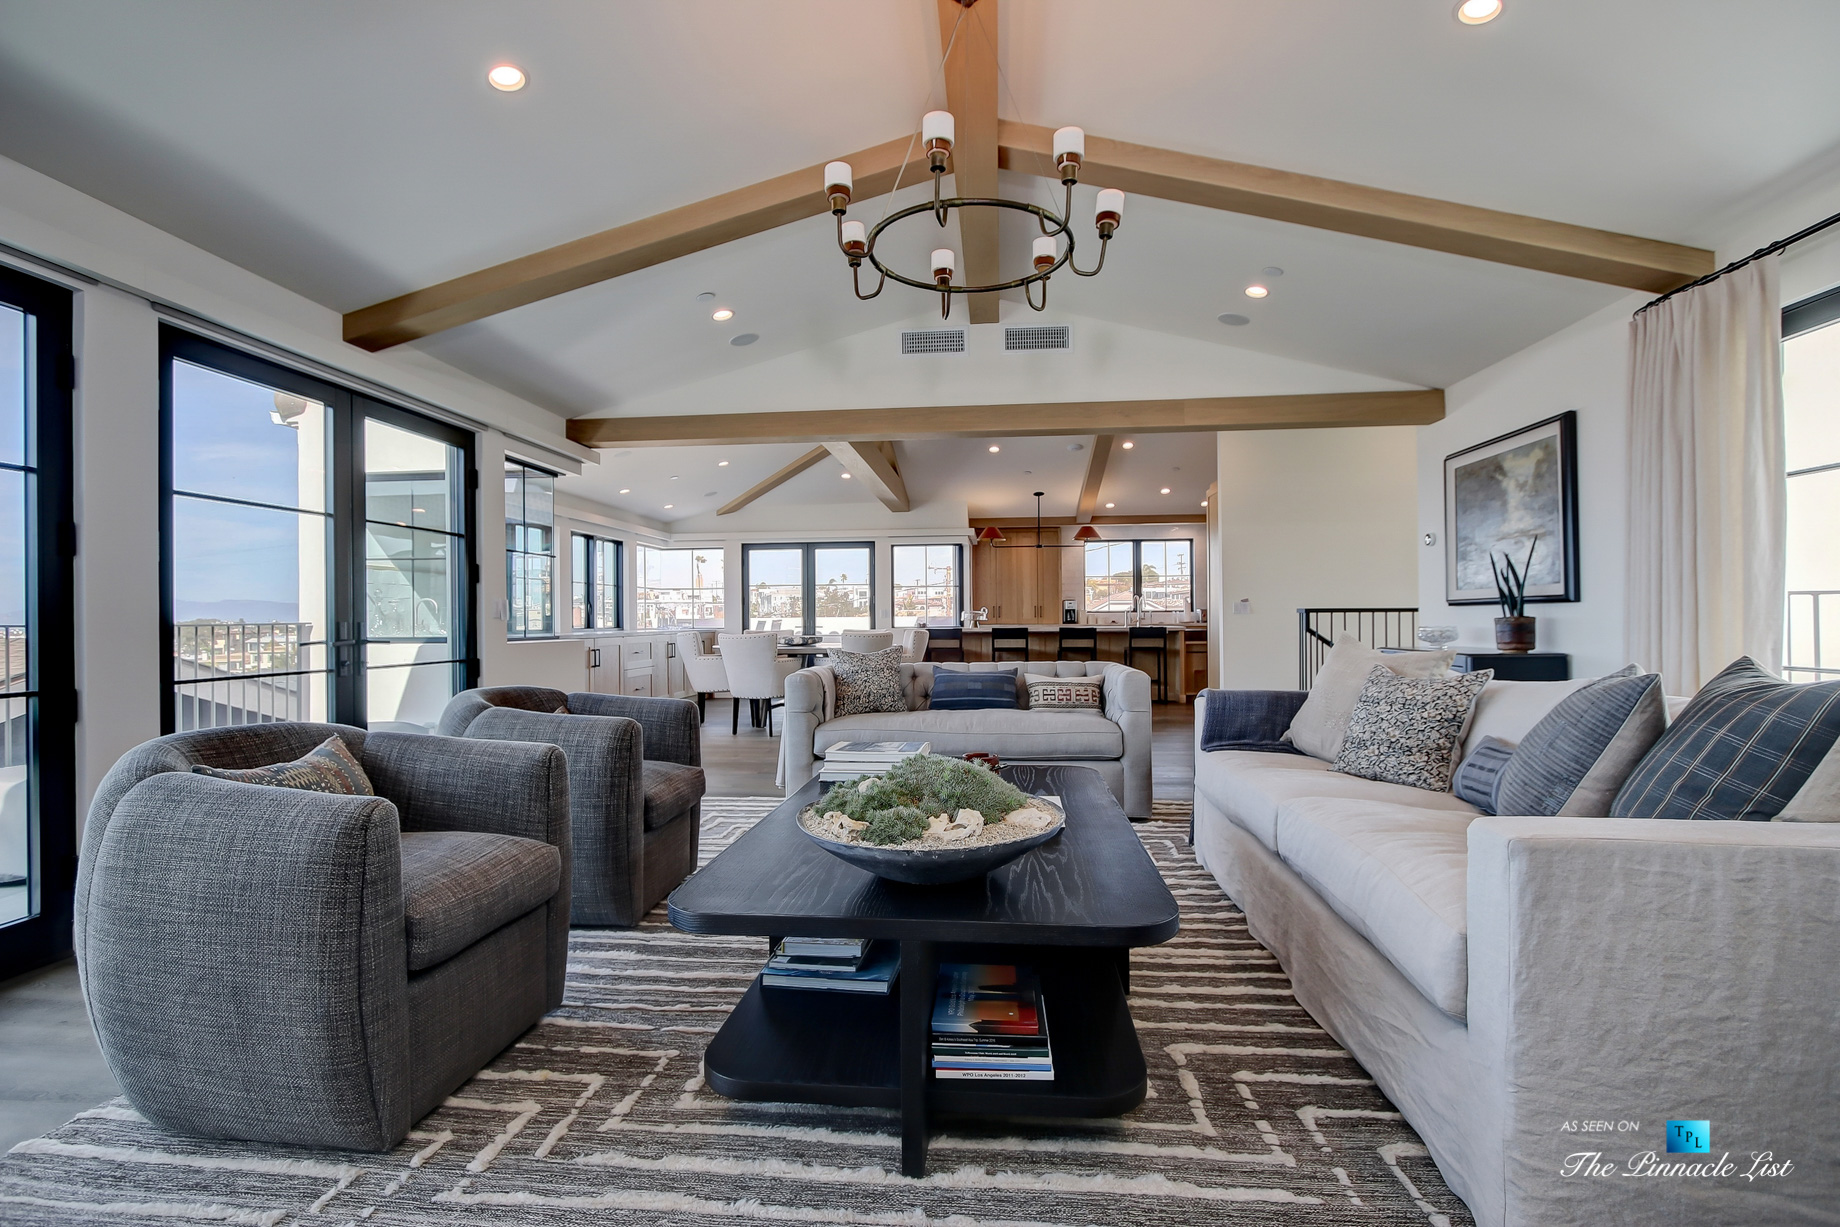 825 Highview Ave, Manhattan Beach, CA, USA - Living Room and Kitchen - Luxury Real Estate - Modern Spanish Home